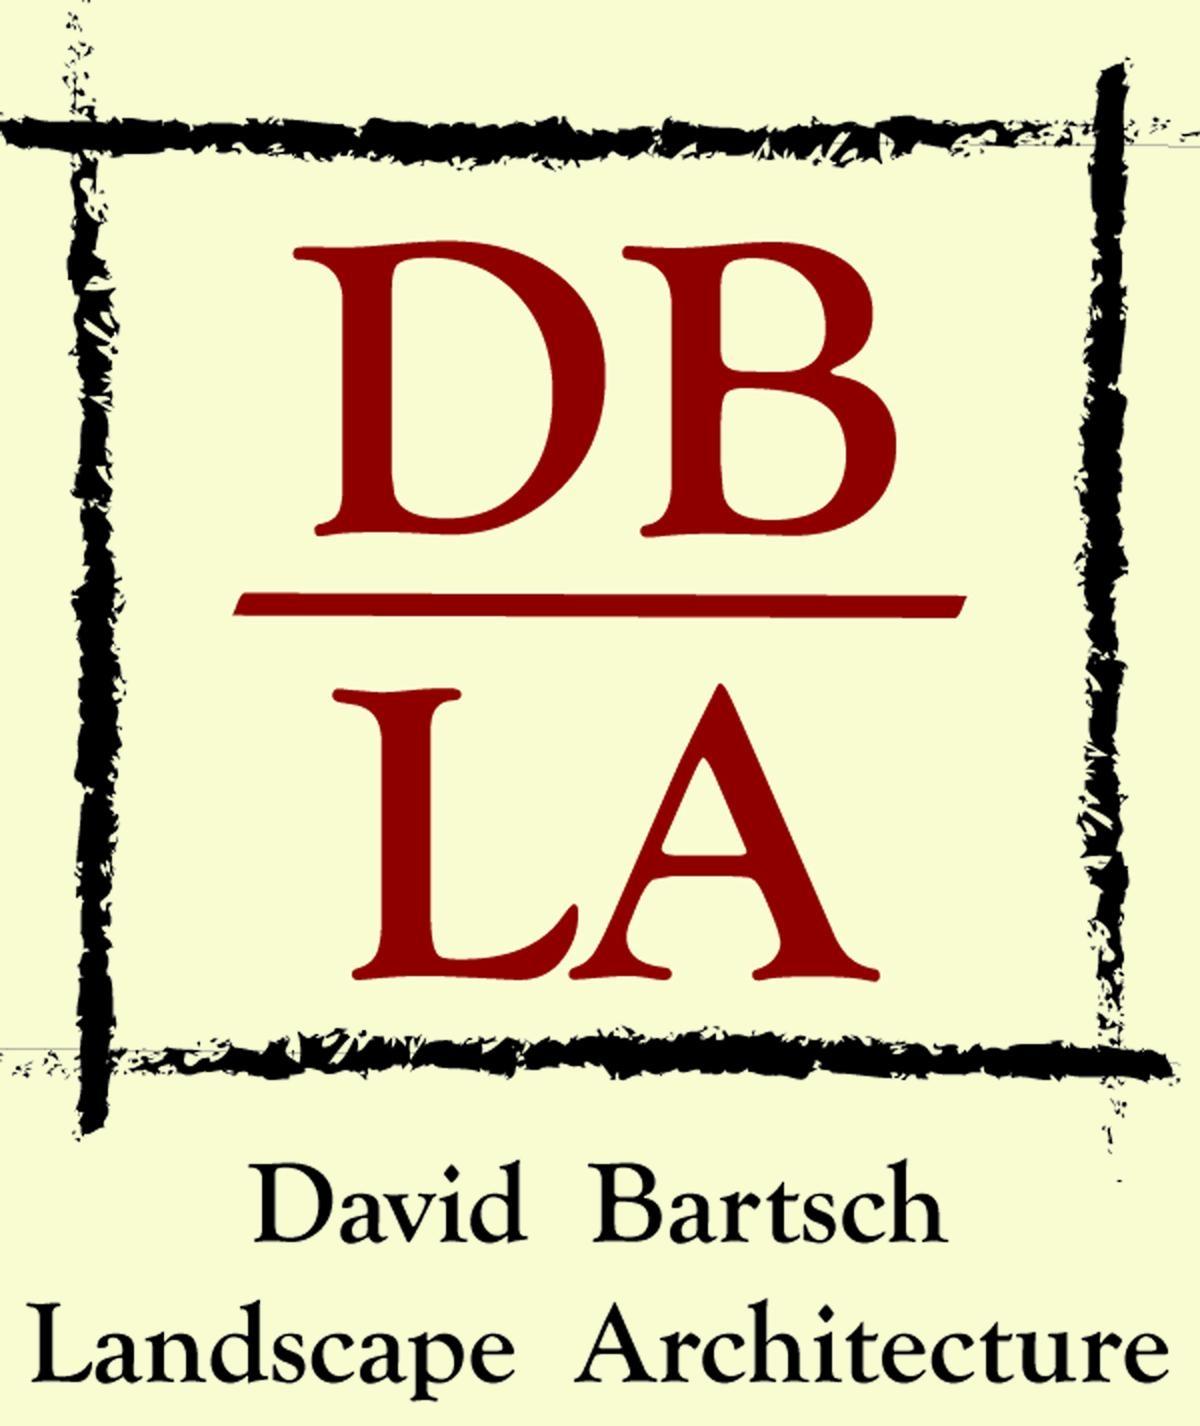 David Bartsch Landscape Architecture LLC - Boston, MA - Landscape Architects & Design